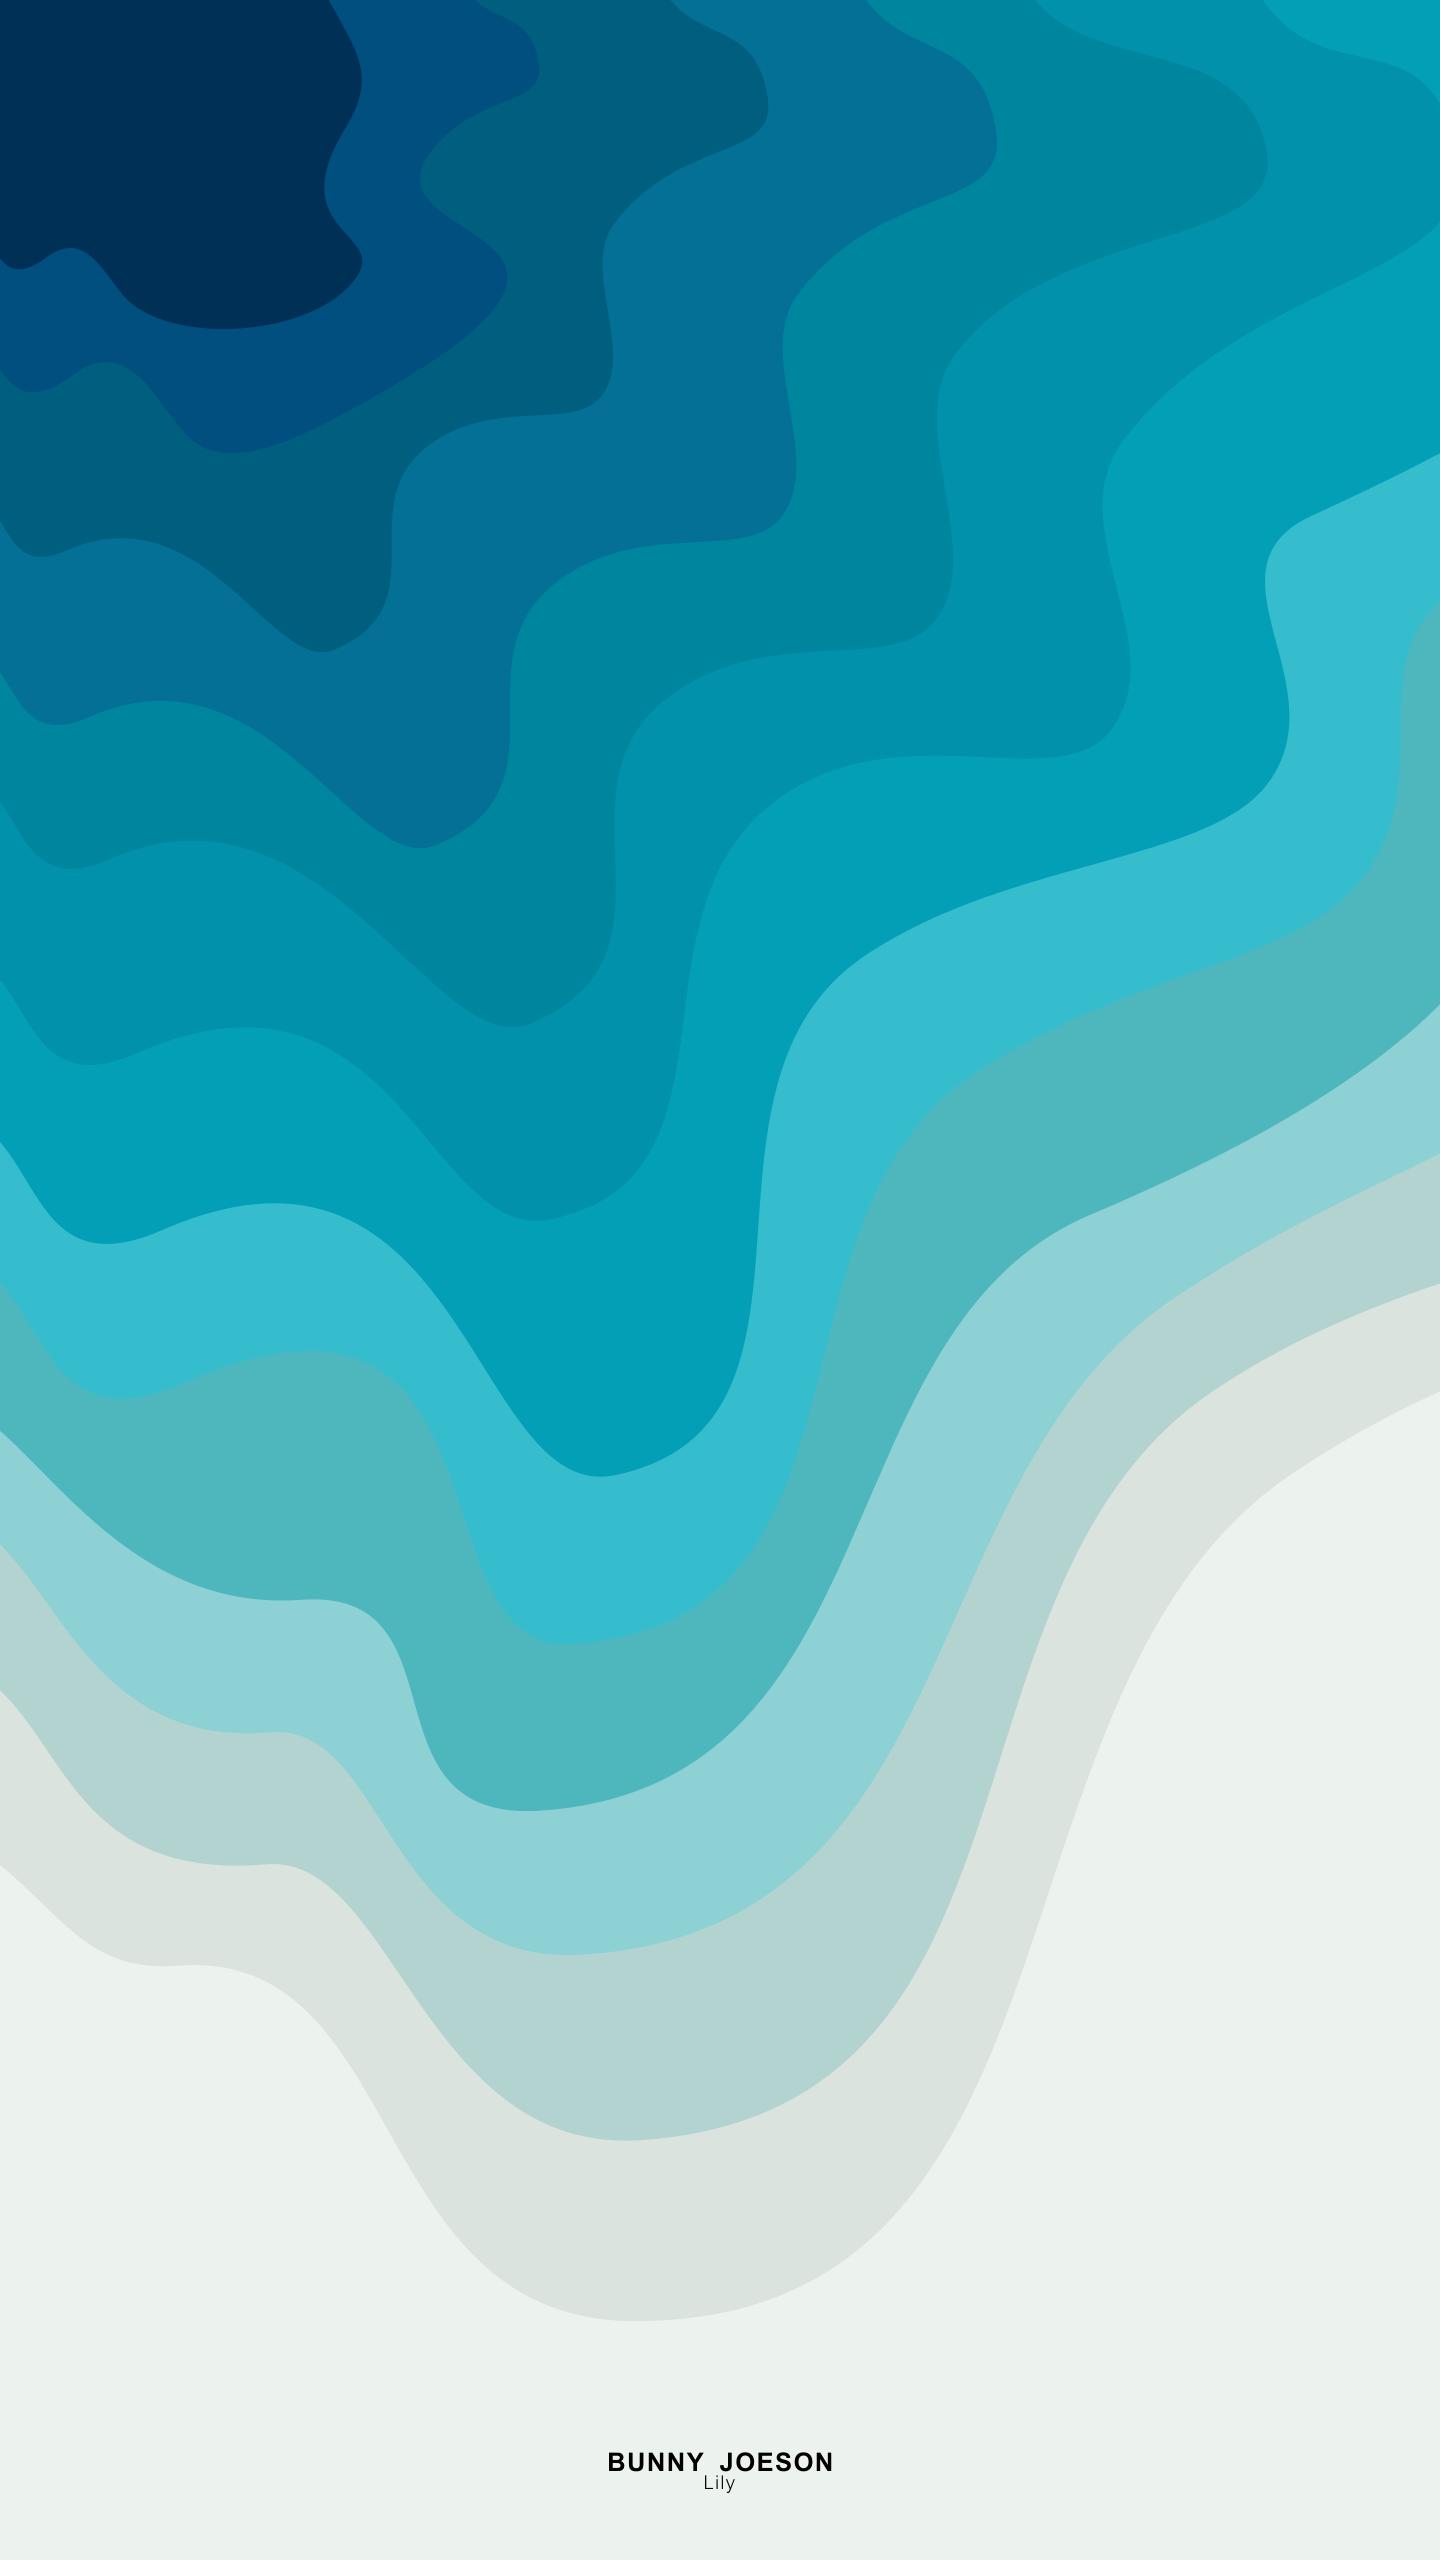 Iphone Phone Life Design Wallpaper Color Ios Android Sea Abstract Iphone Wallpaper Abstract Pattern Design Teal Art